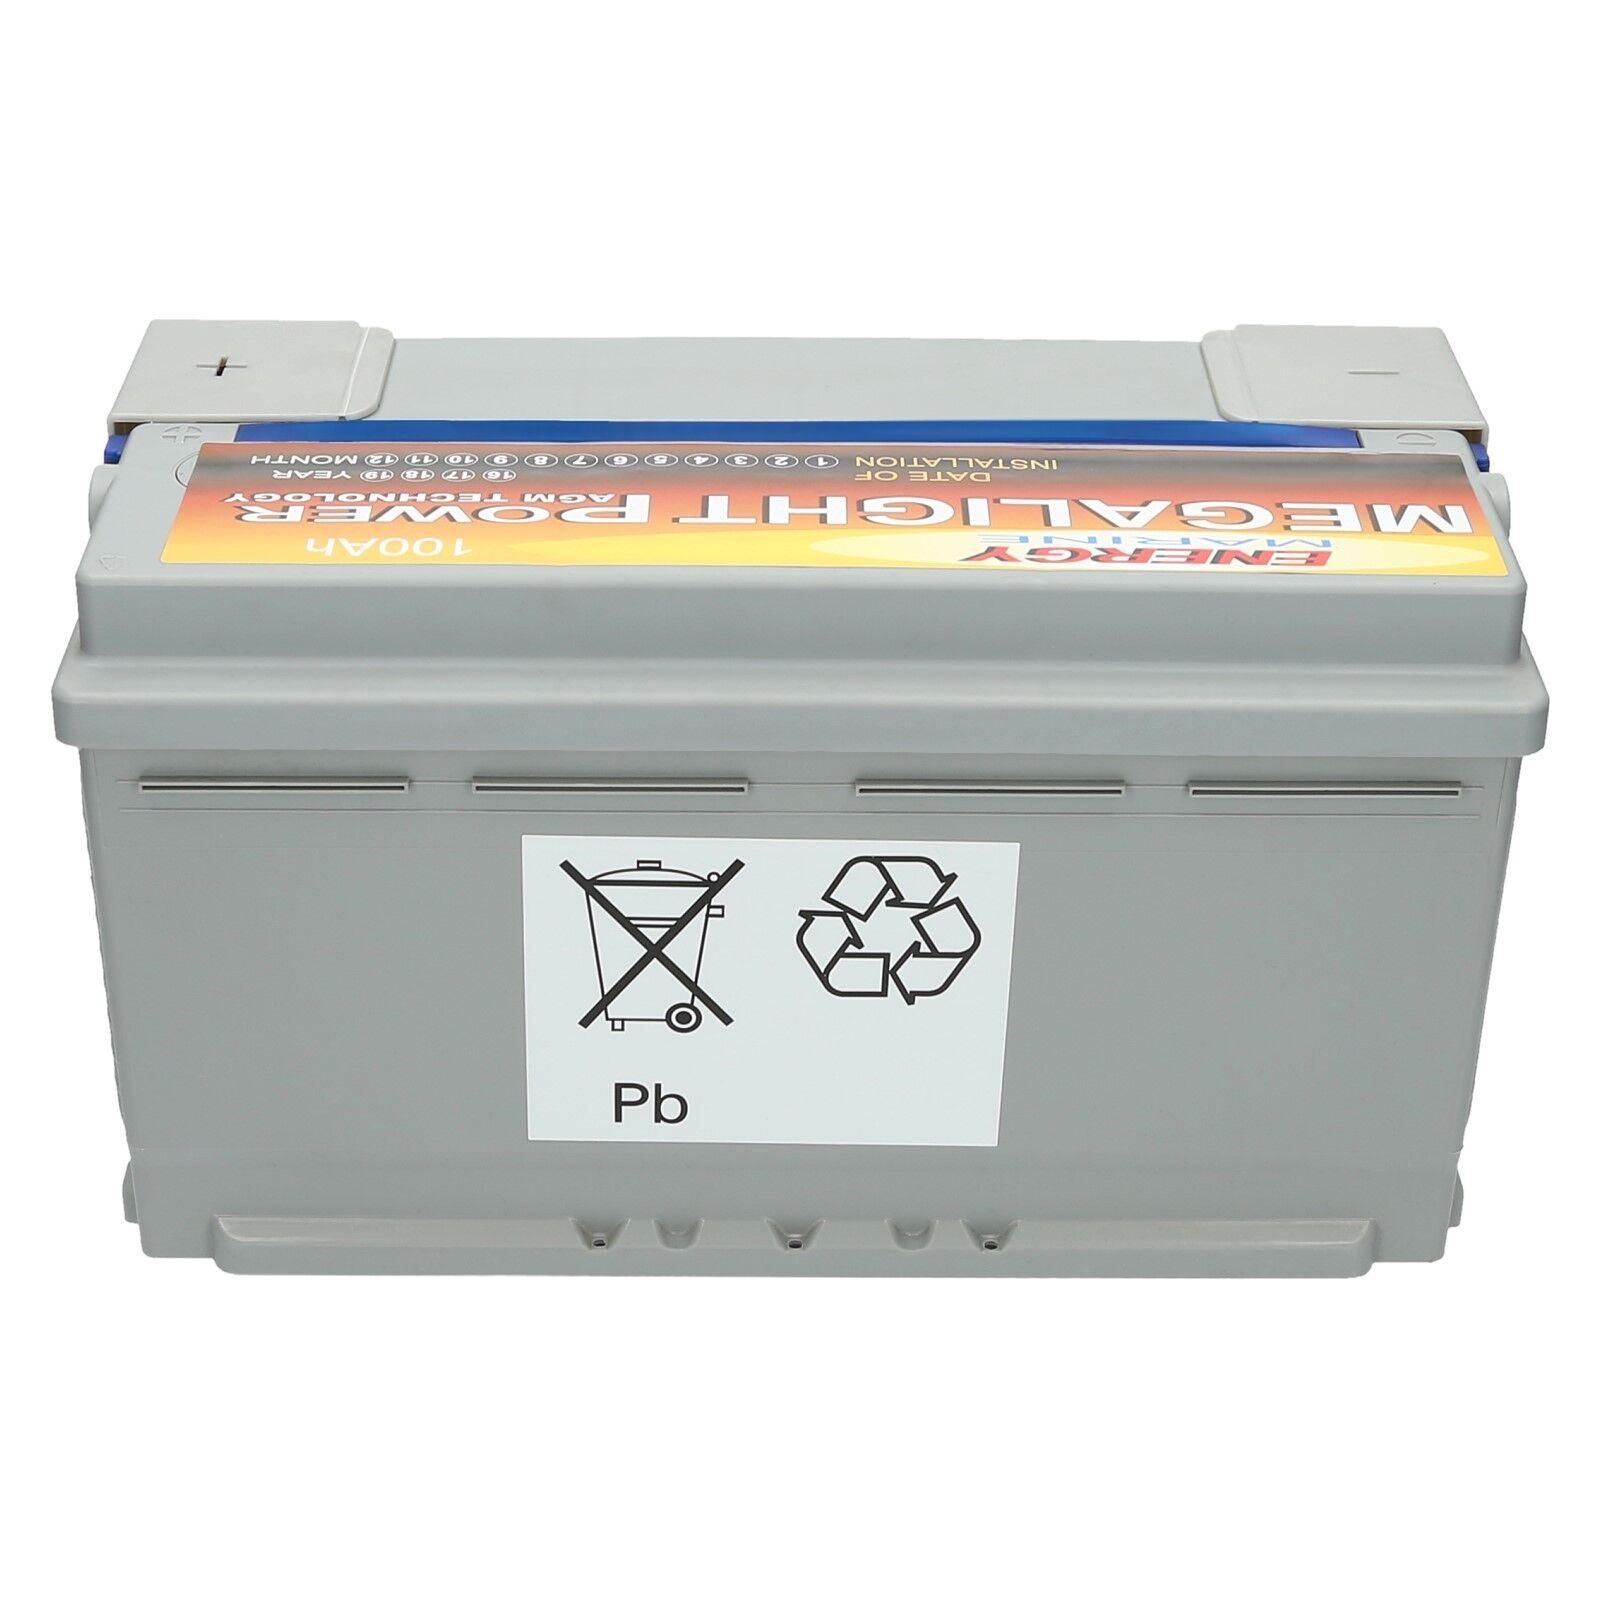 2 x Megalight 12V 100AH AGM Verbindungskabel Batterie + Verbindungskabel AGM für 24 Volt Außenborder 251d16